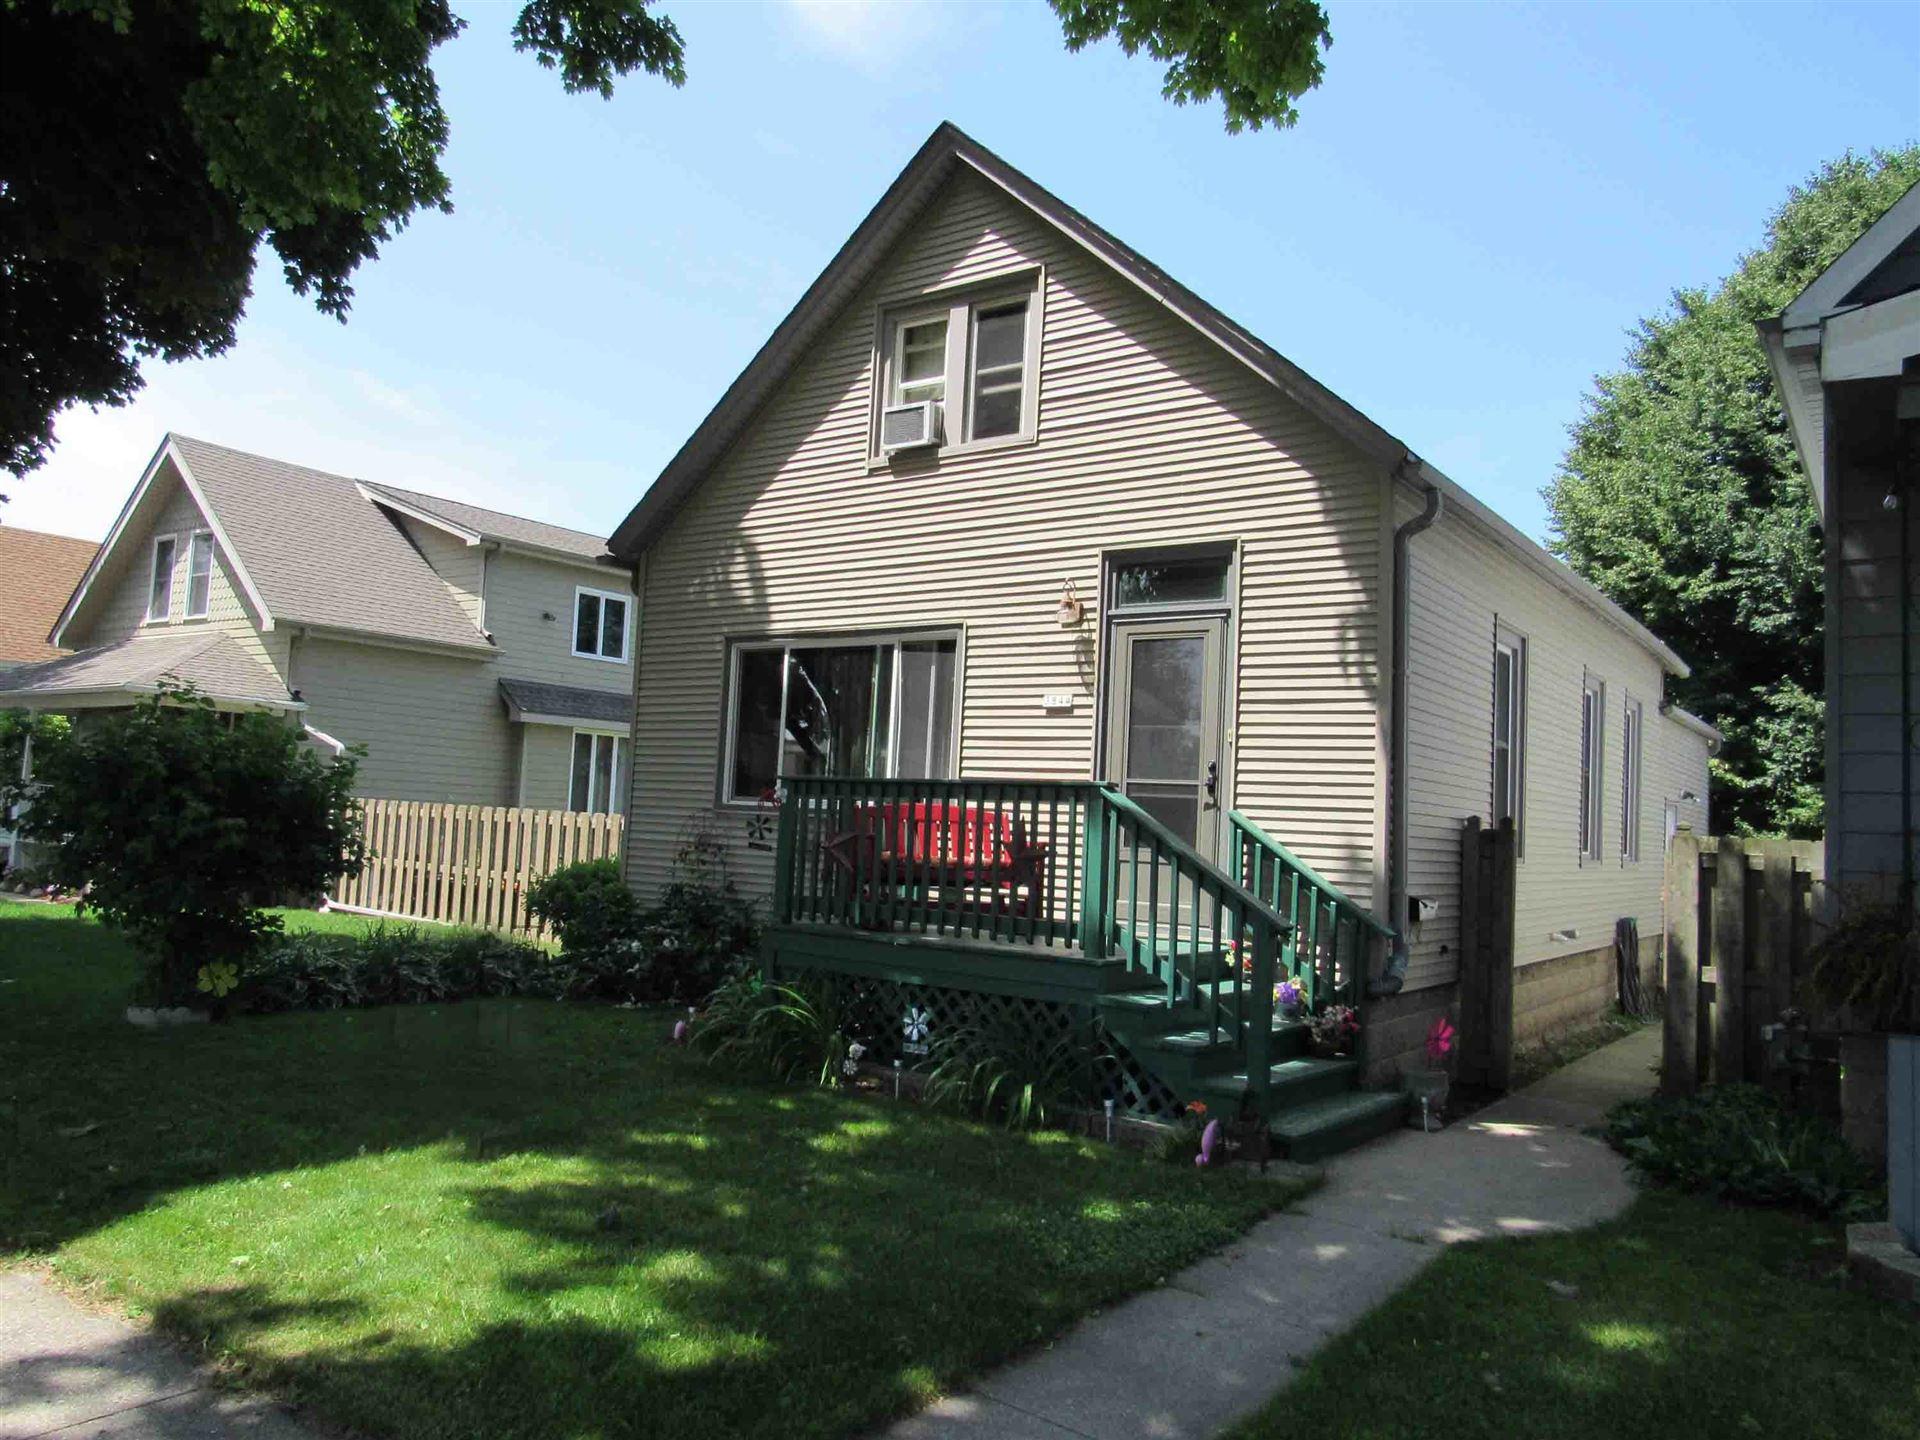 3844 E Squire Ave, Cudahy, WI 53110 - #: 1696753